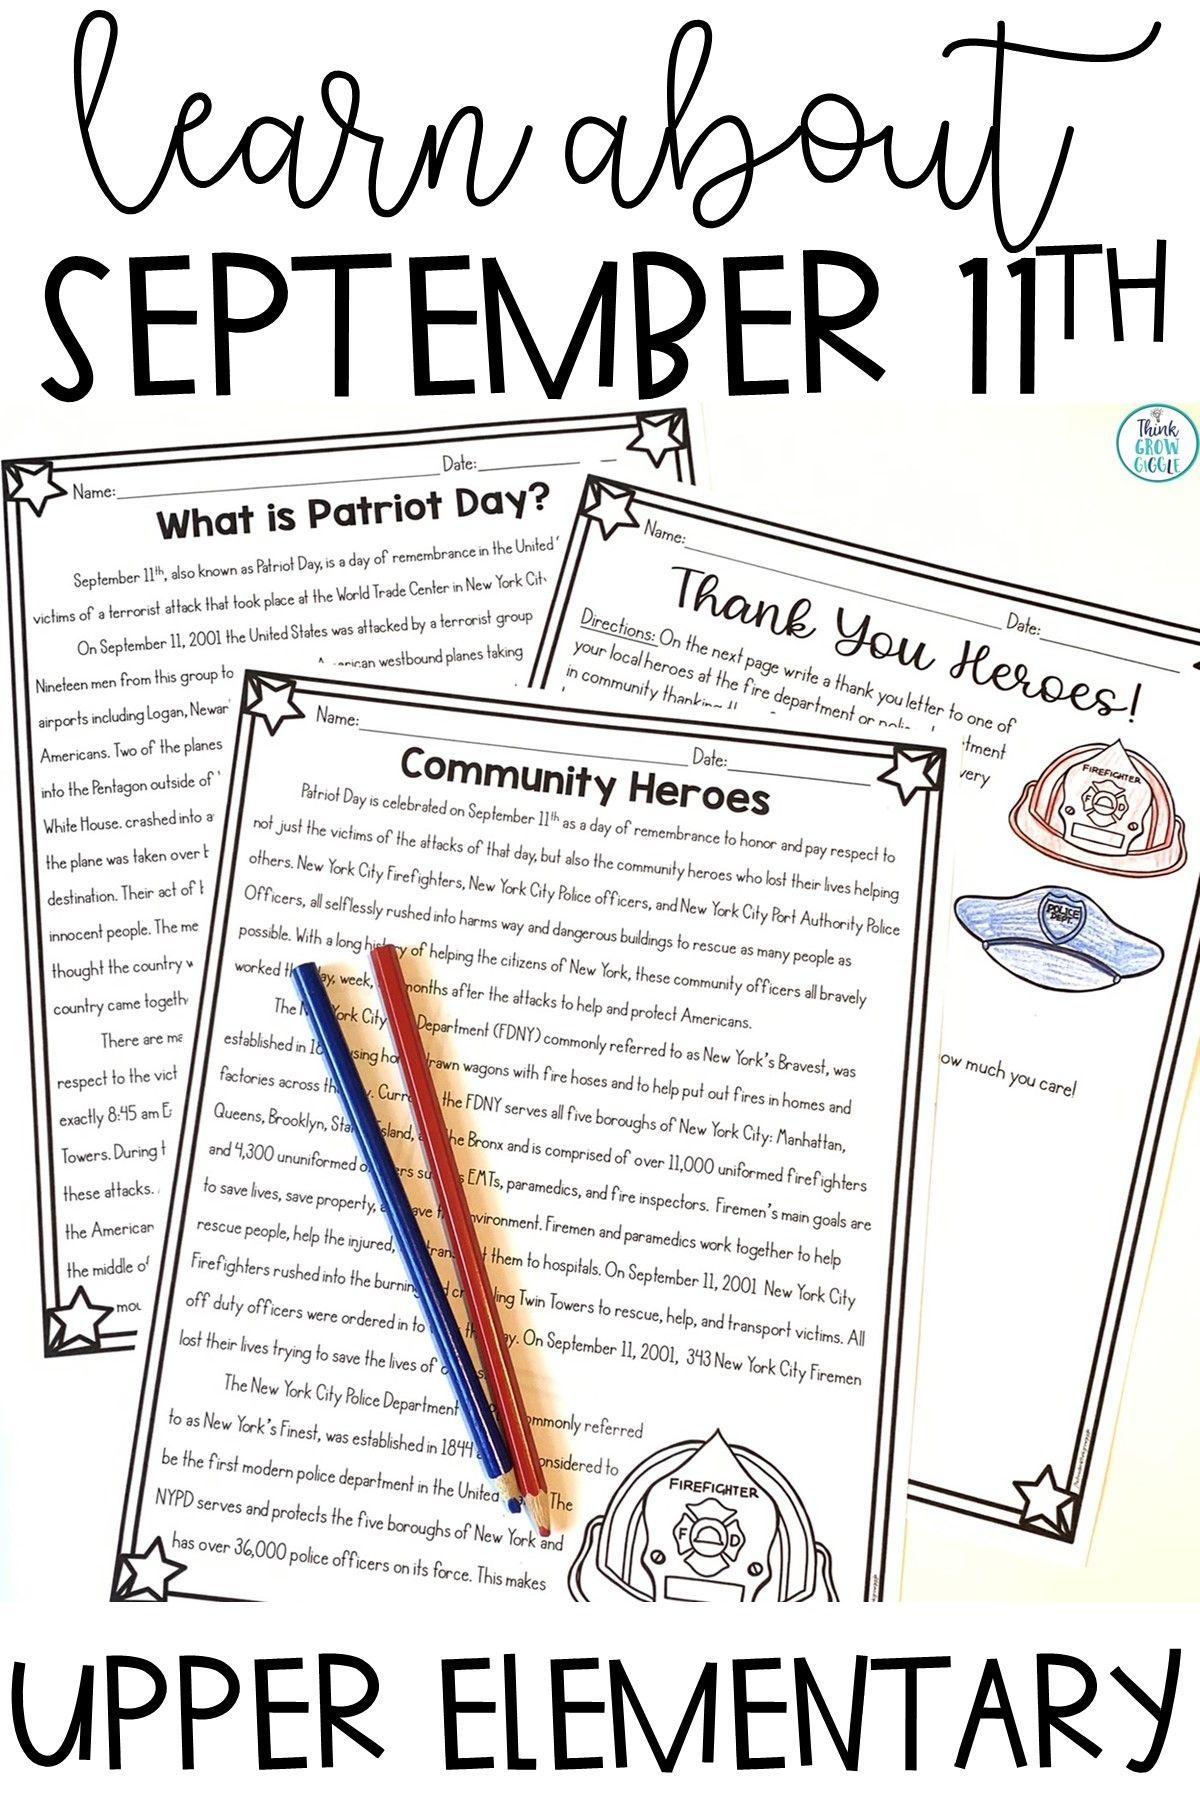 September 11 Activities